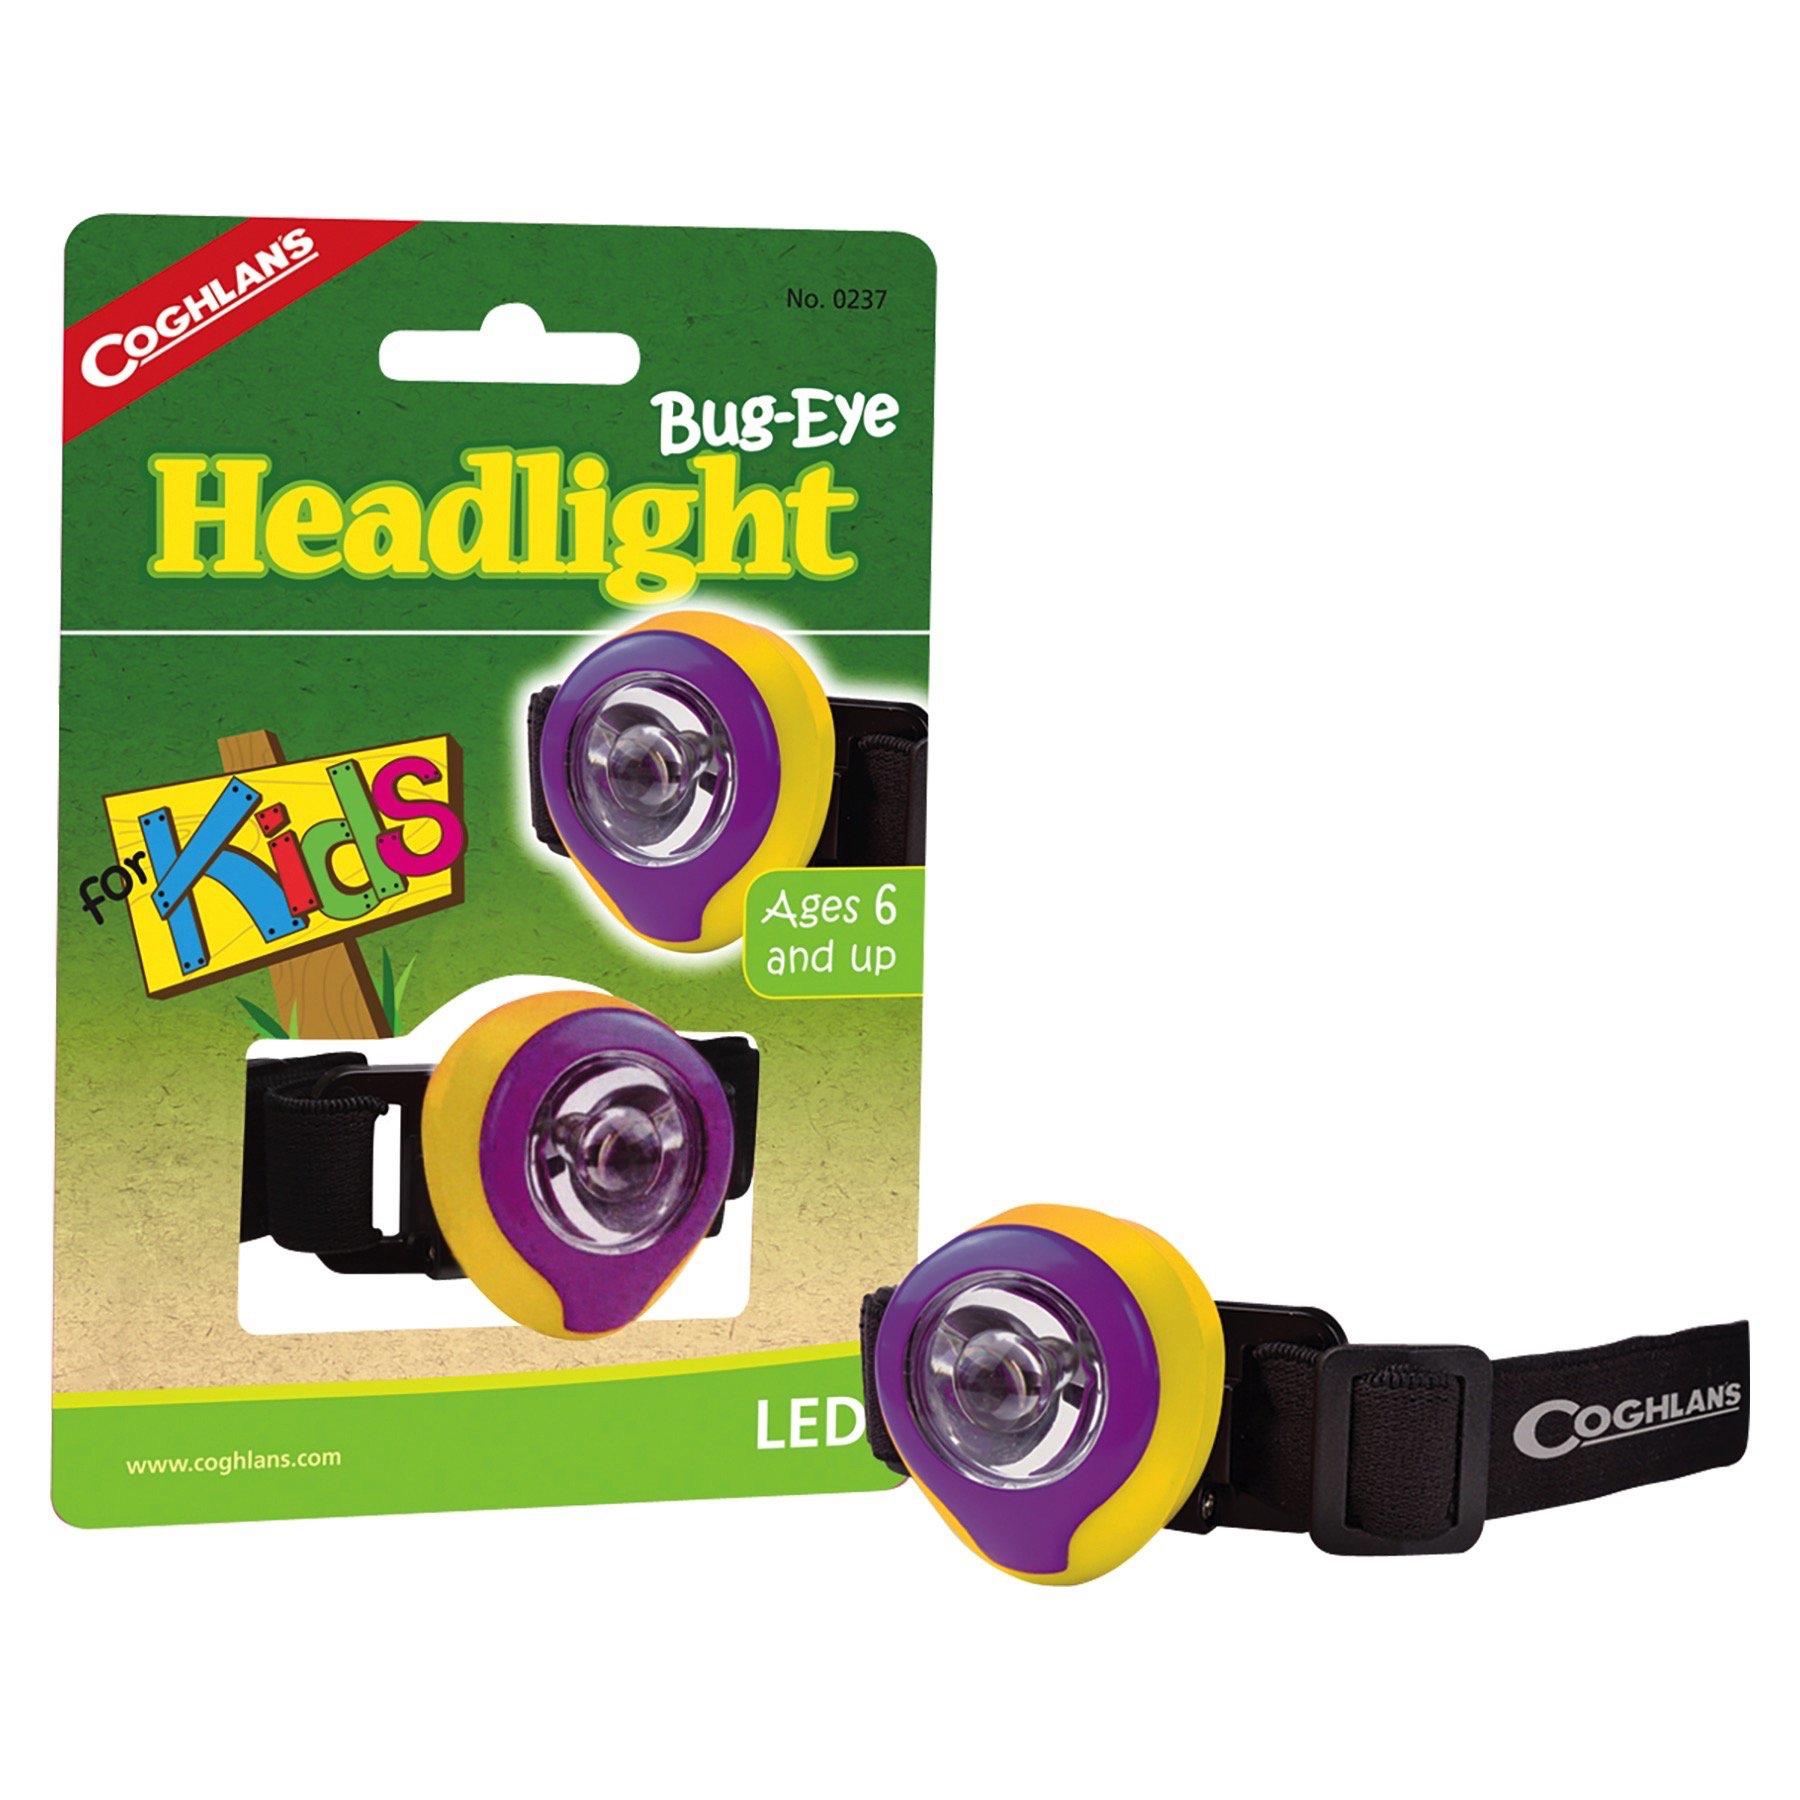 Coghlan/'s Bug-Eye Headlight for Kids LED Headlamp Compact Lightweight 4-Pack